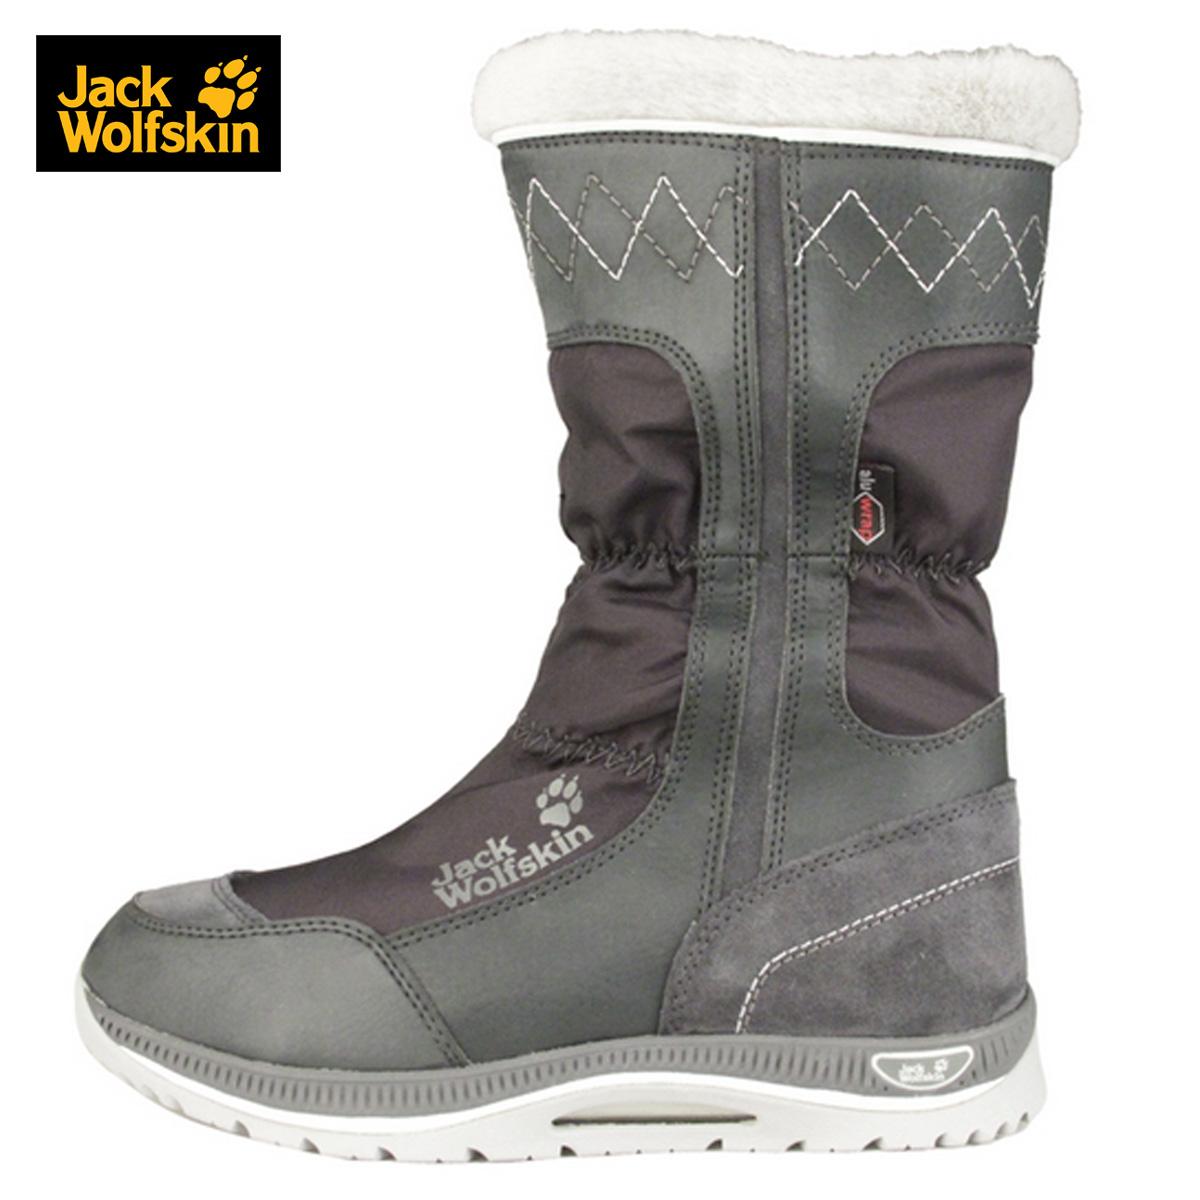 Зимние ботинки Jack wolfskin 4004221 23 SKU1 Jack wolfskin / Dewclaws